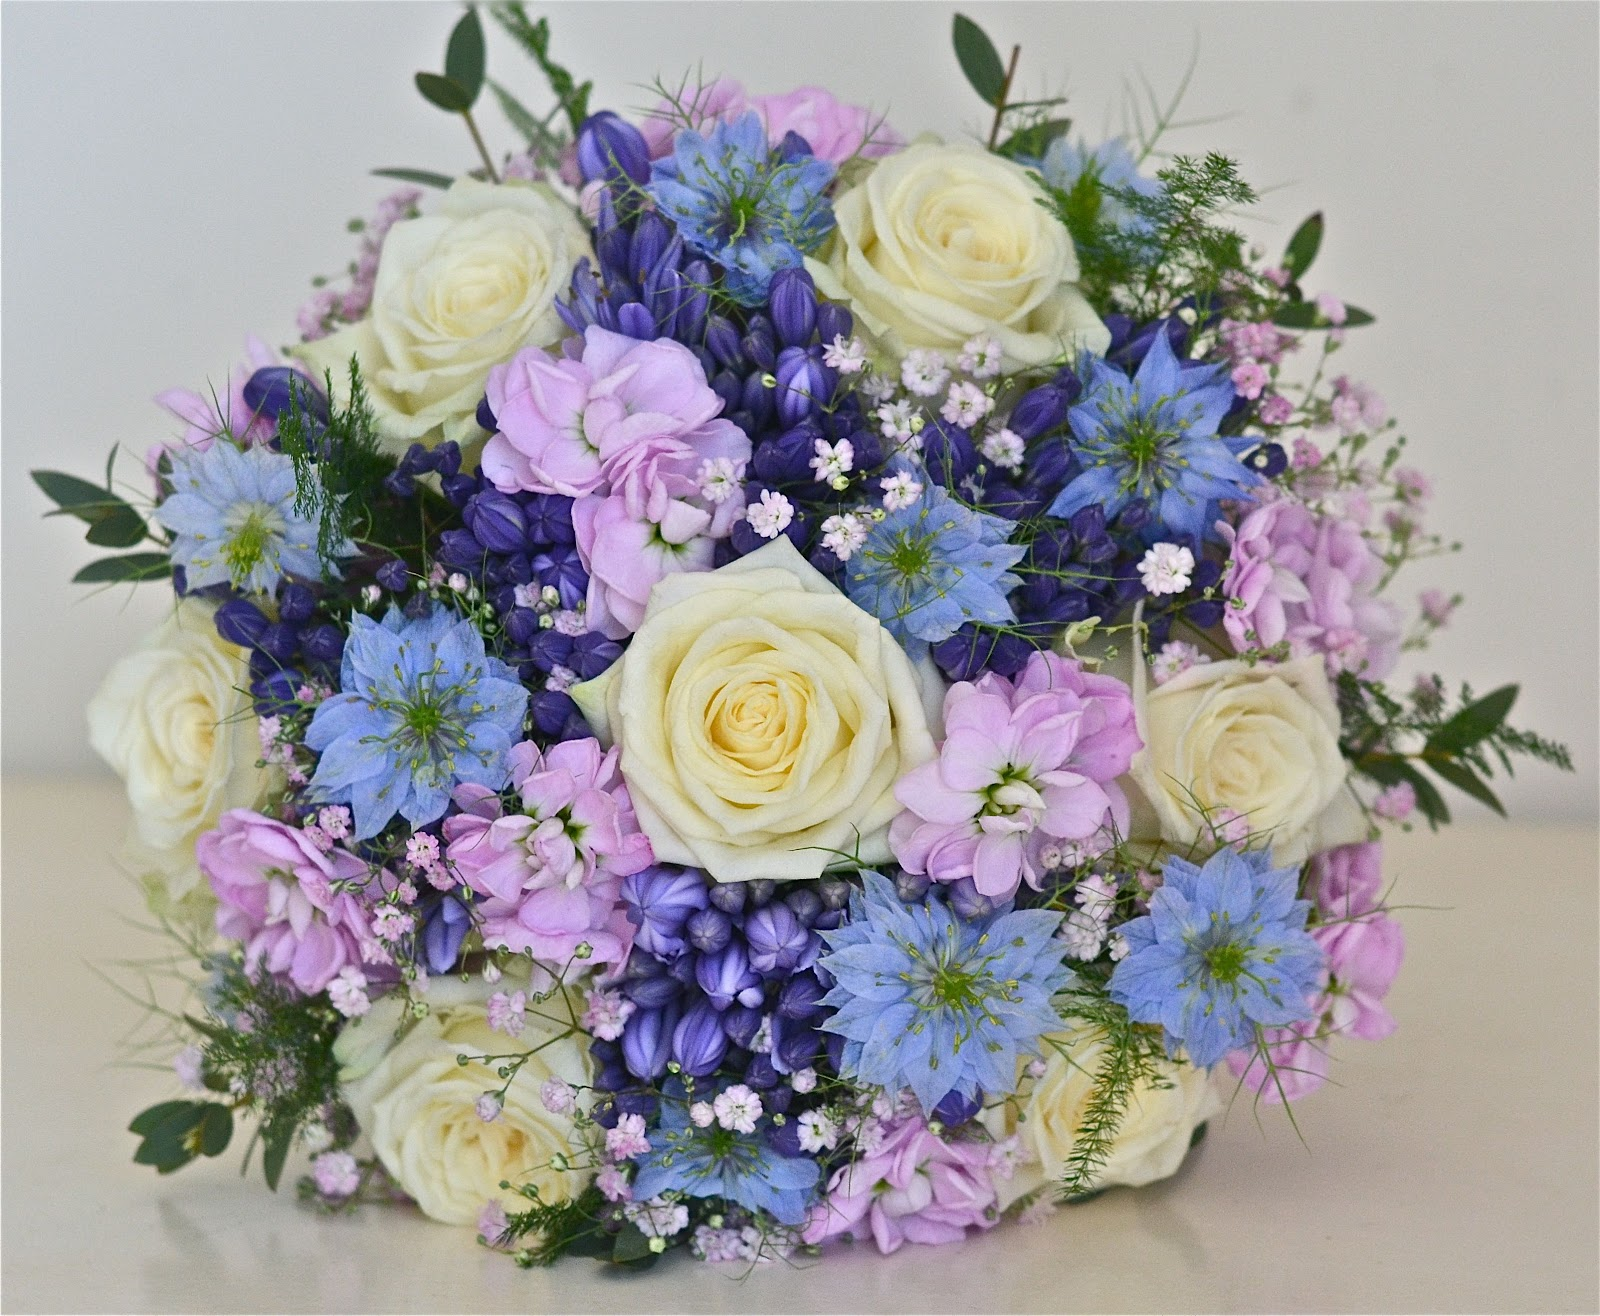 Laura S Vintage English Country Garden Wedding Flowers Marwell Hotel